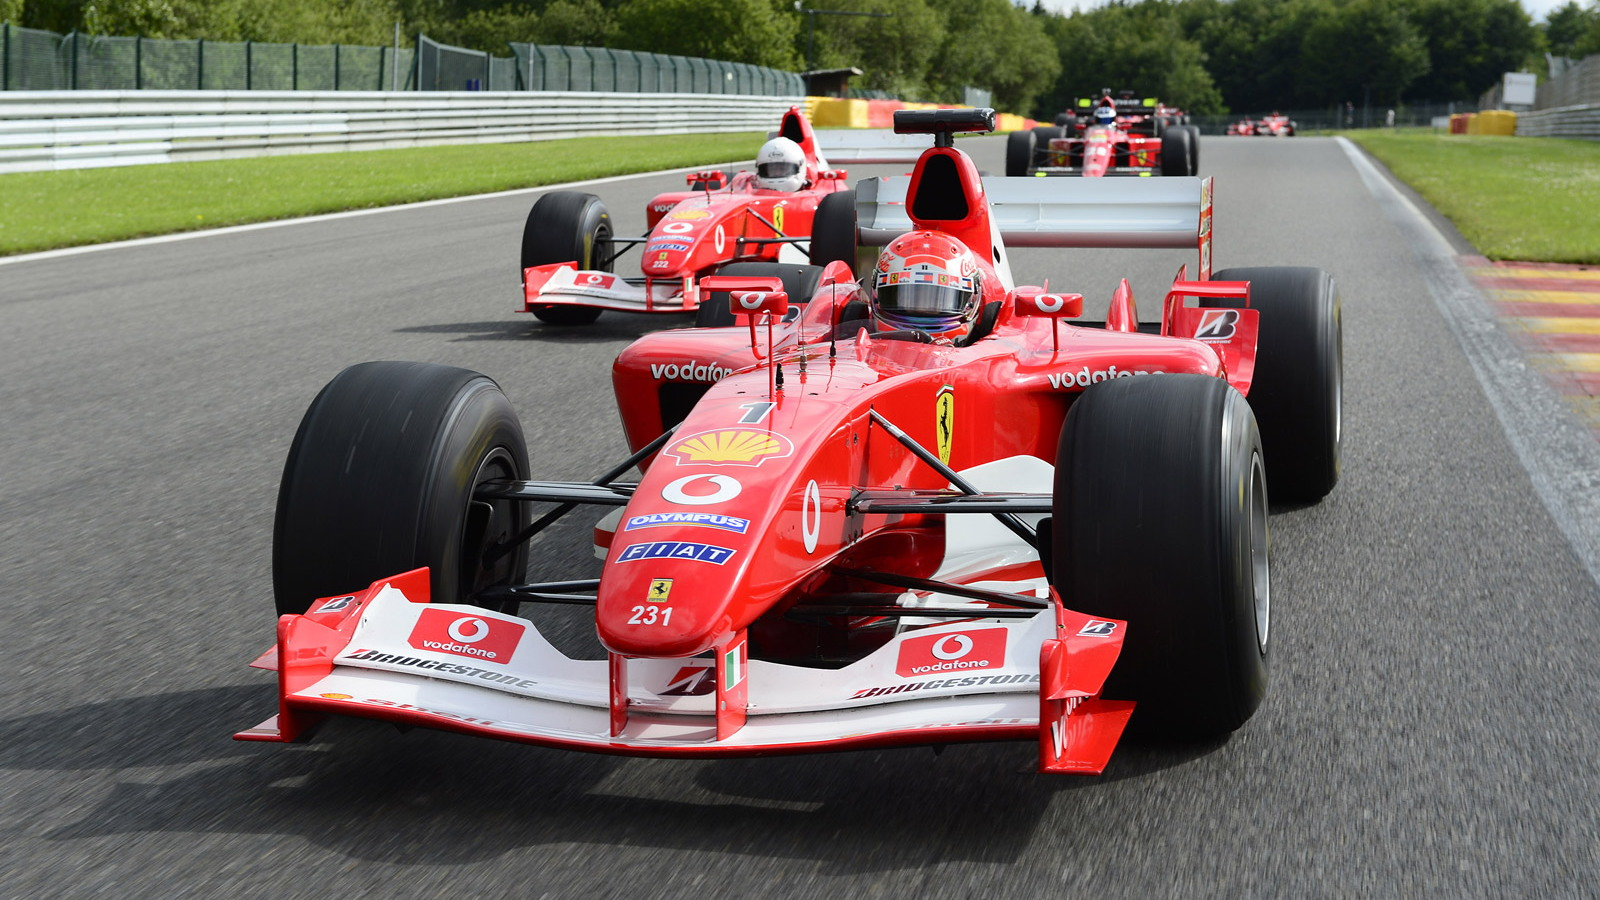 Ferrari F1 Clienti and XX Program at Spa Francorchamps, July 2012